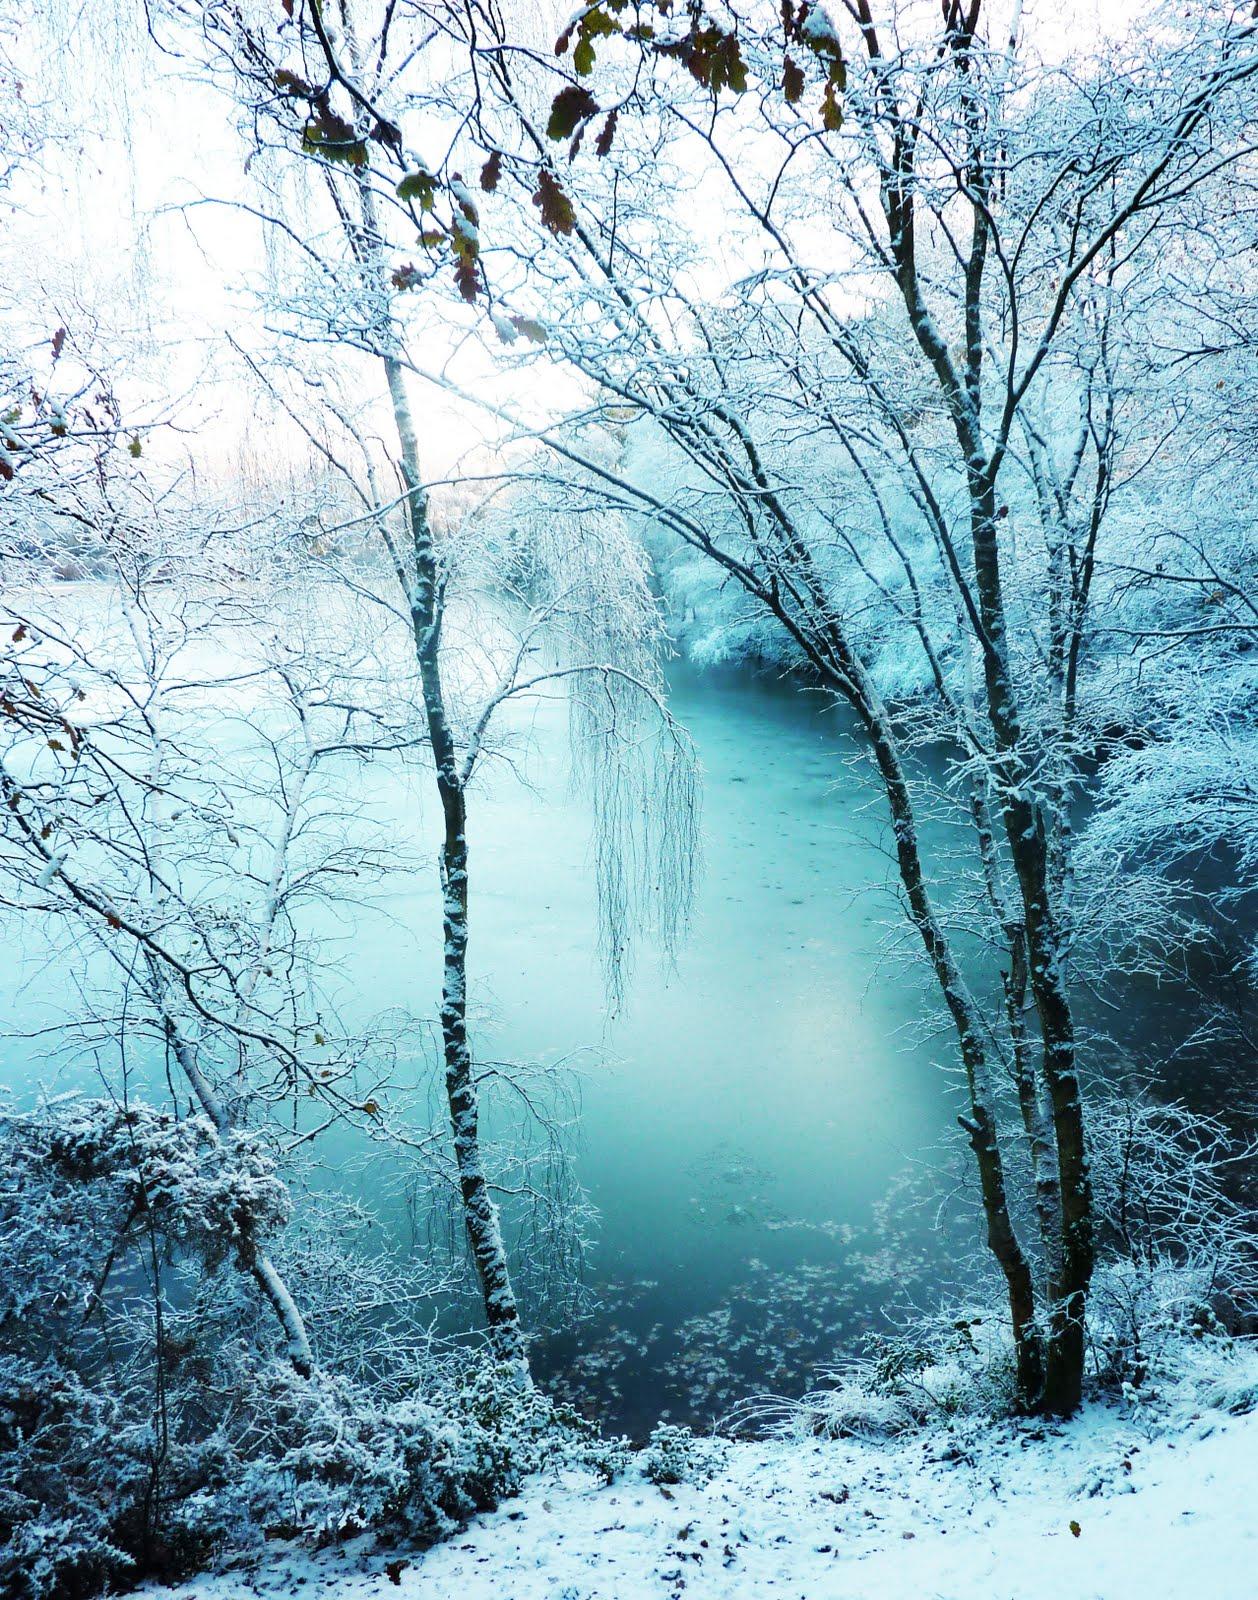 Winona Harrod BA Hons: Winter Wonderland